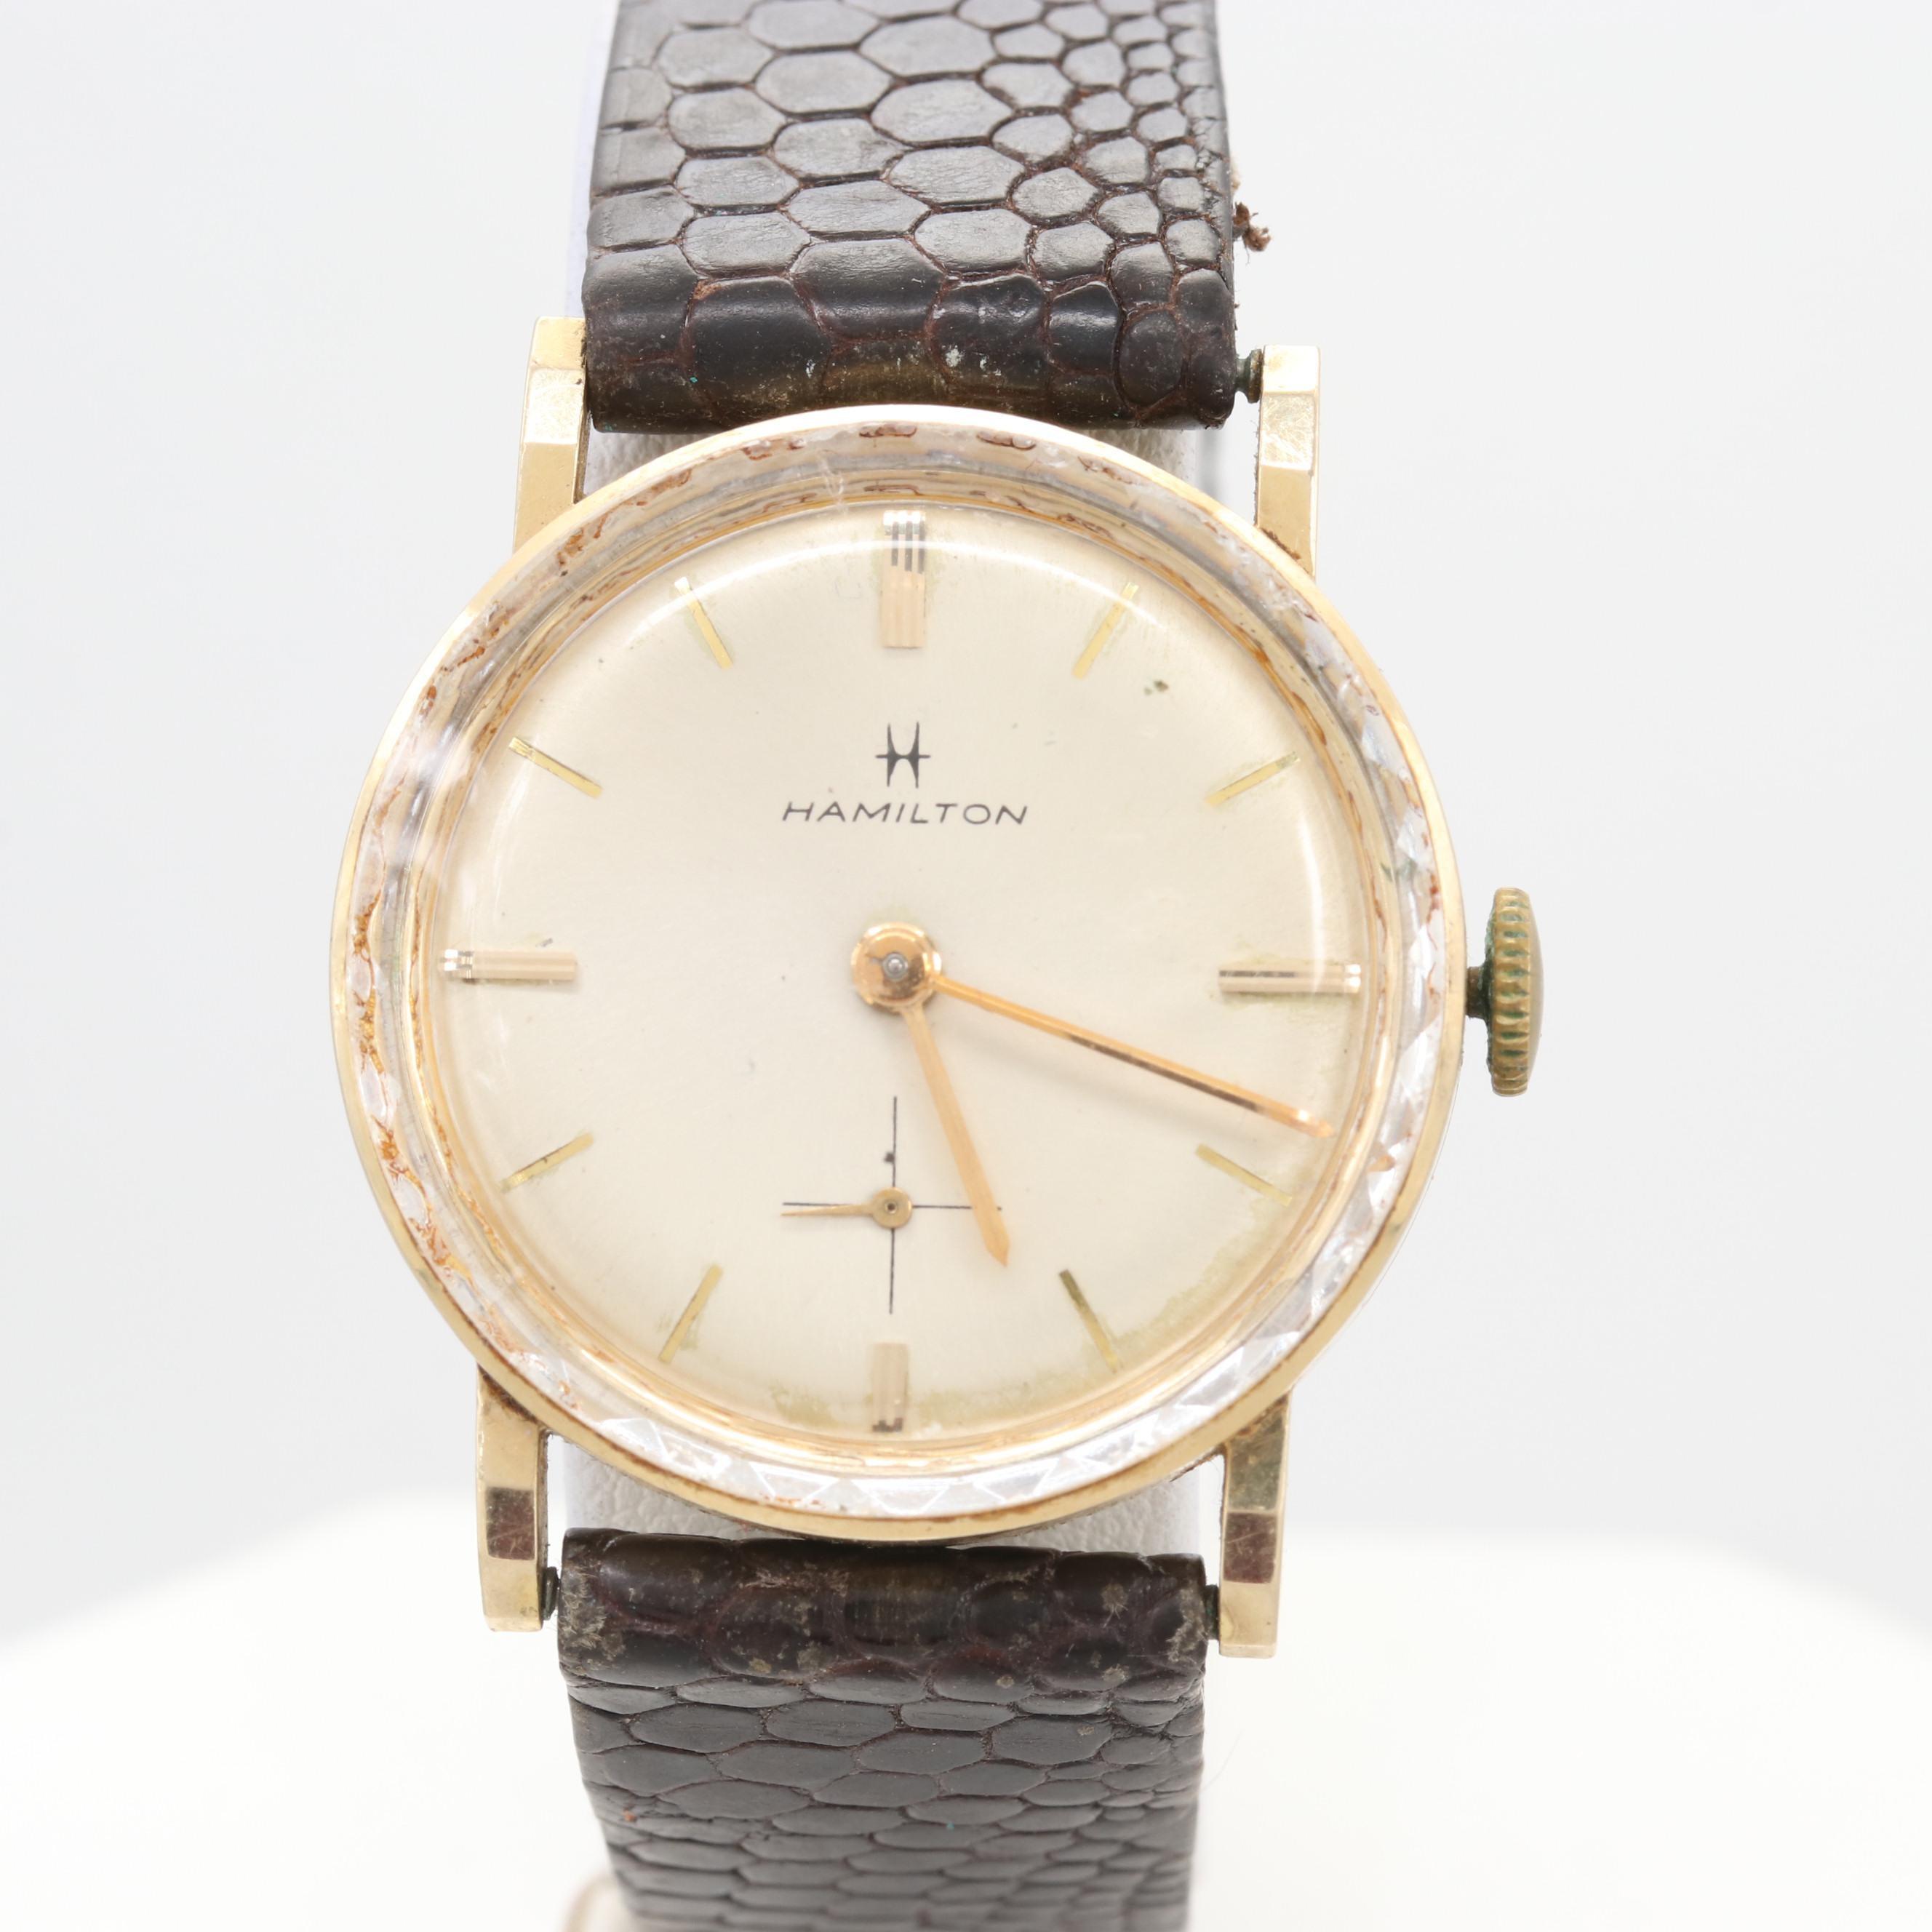 Vintage Hamilton 14K Yellow Gold Stem Wind Wristwatch